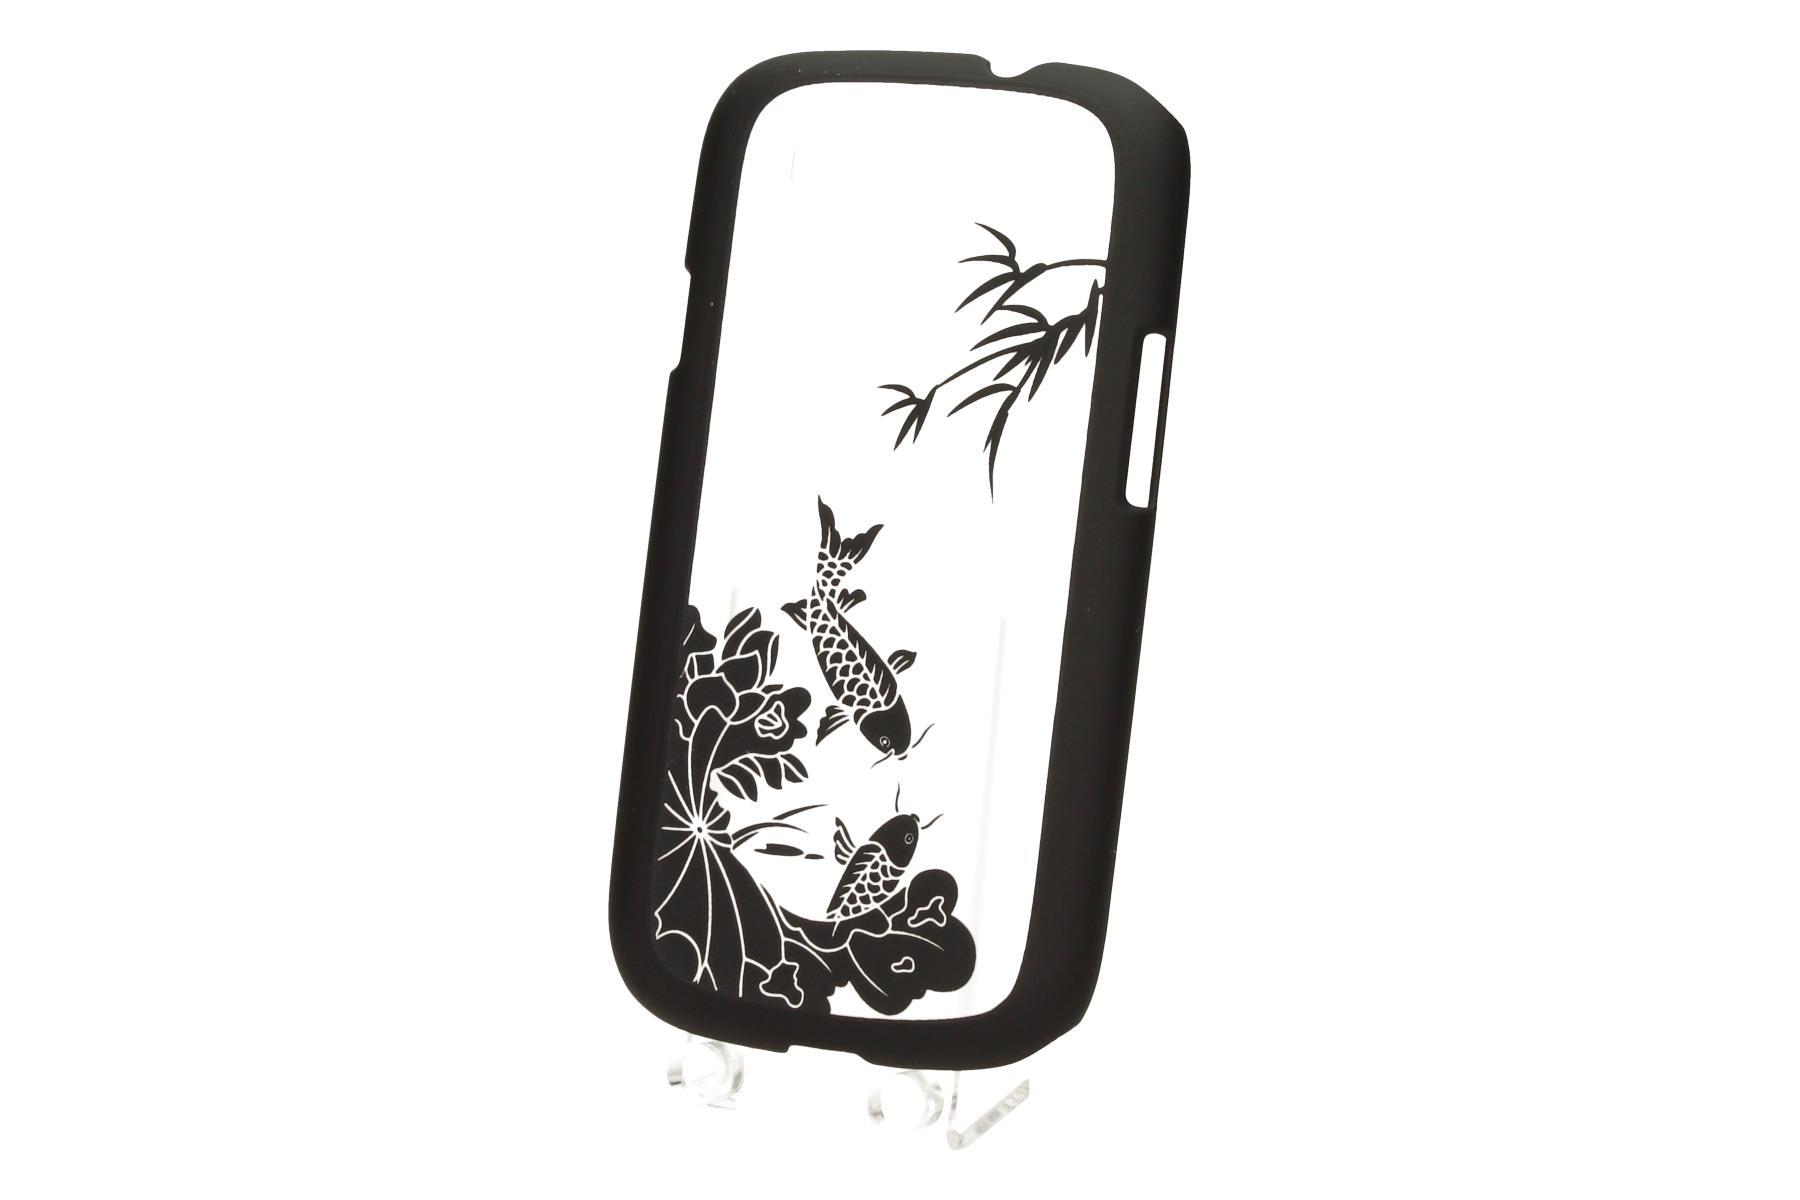 TB Touch pouzdro pro Samsung S3 black